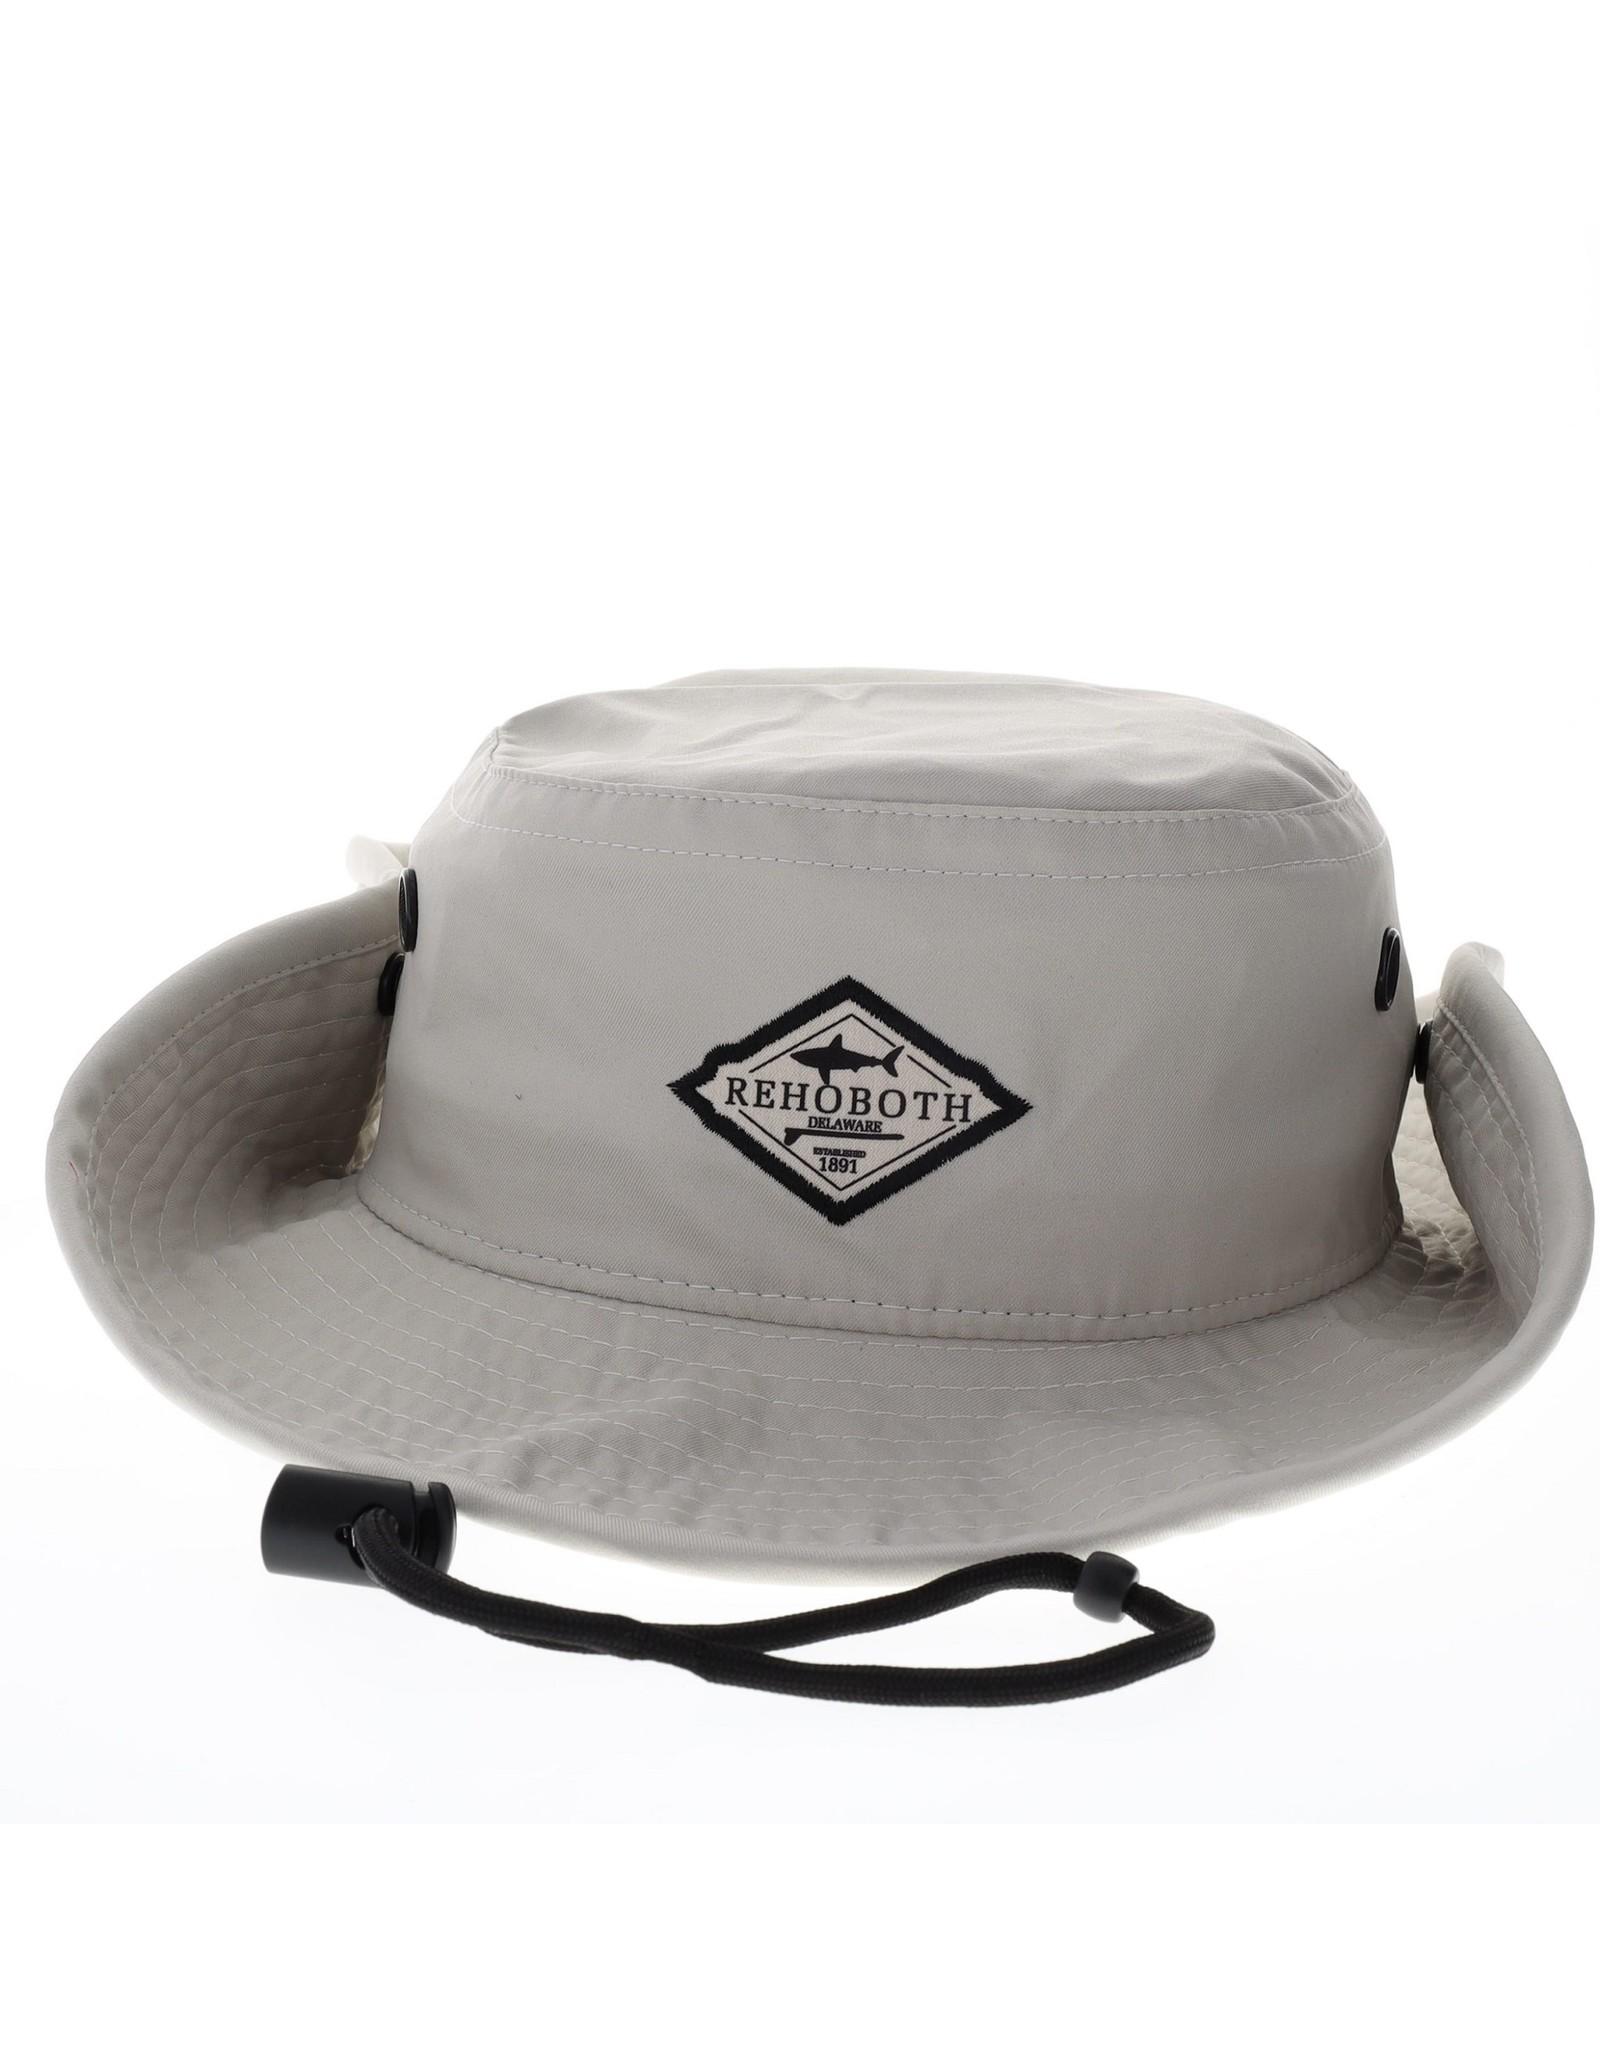 LEGACY ATHLETICS LEGACY COOL FIT BUCKET HAT